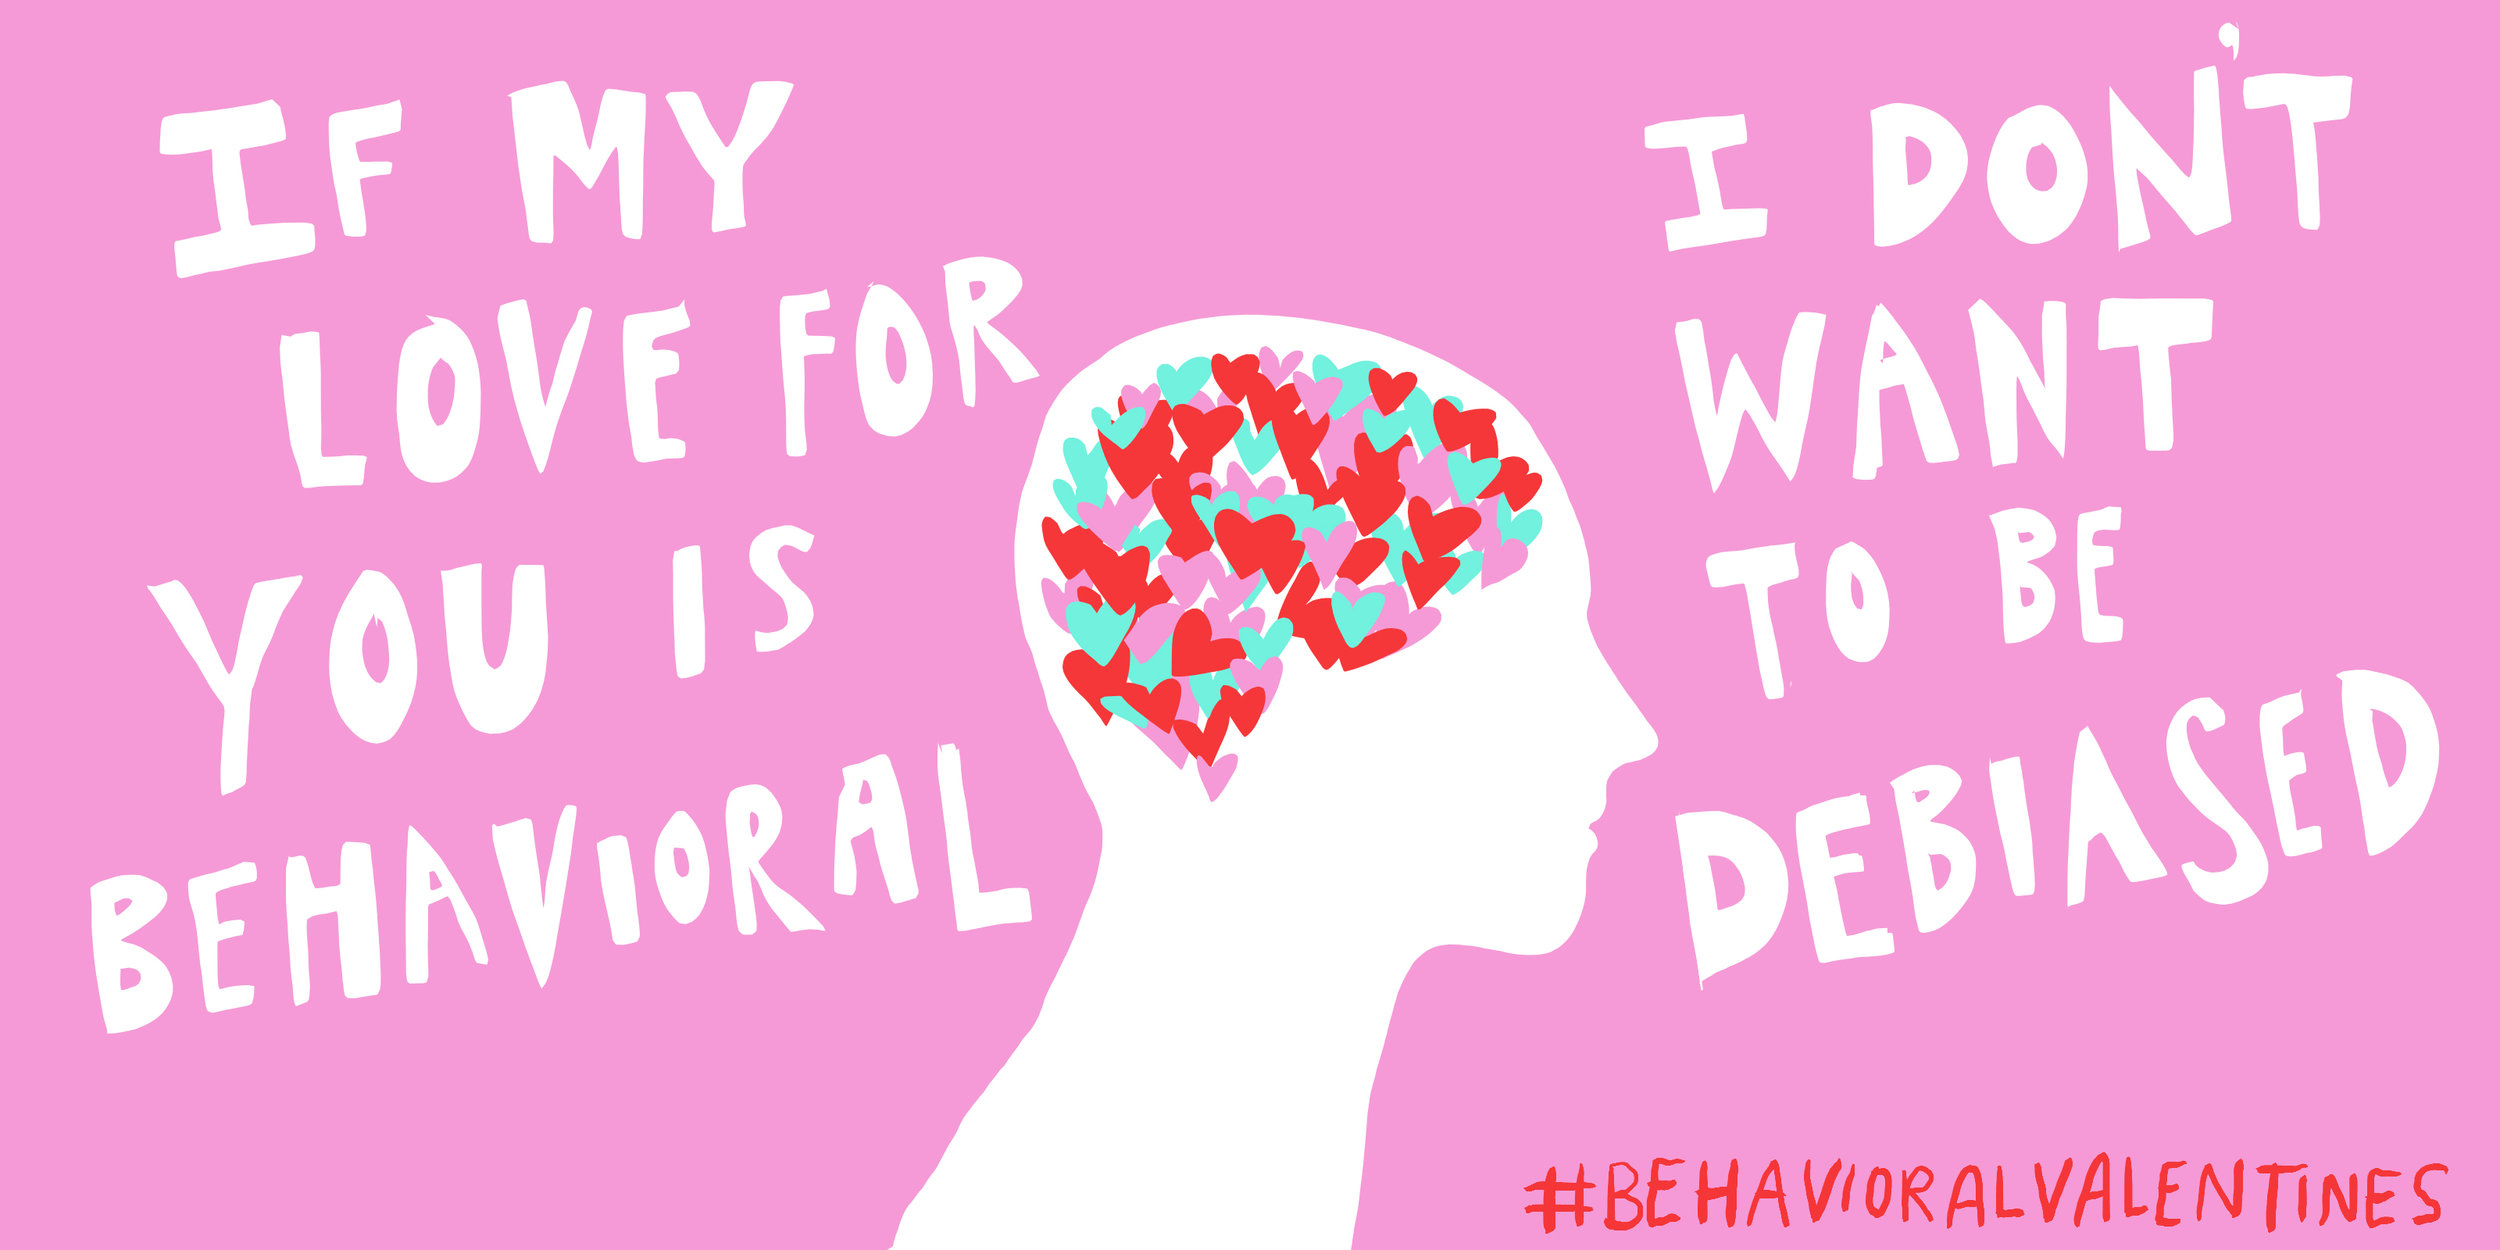 Share this #BehavioralValentines on Twitter